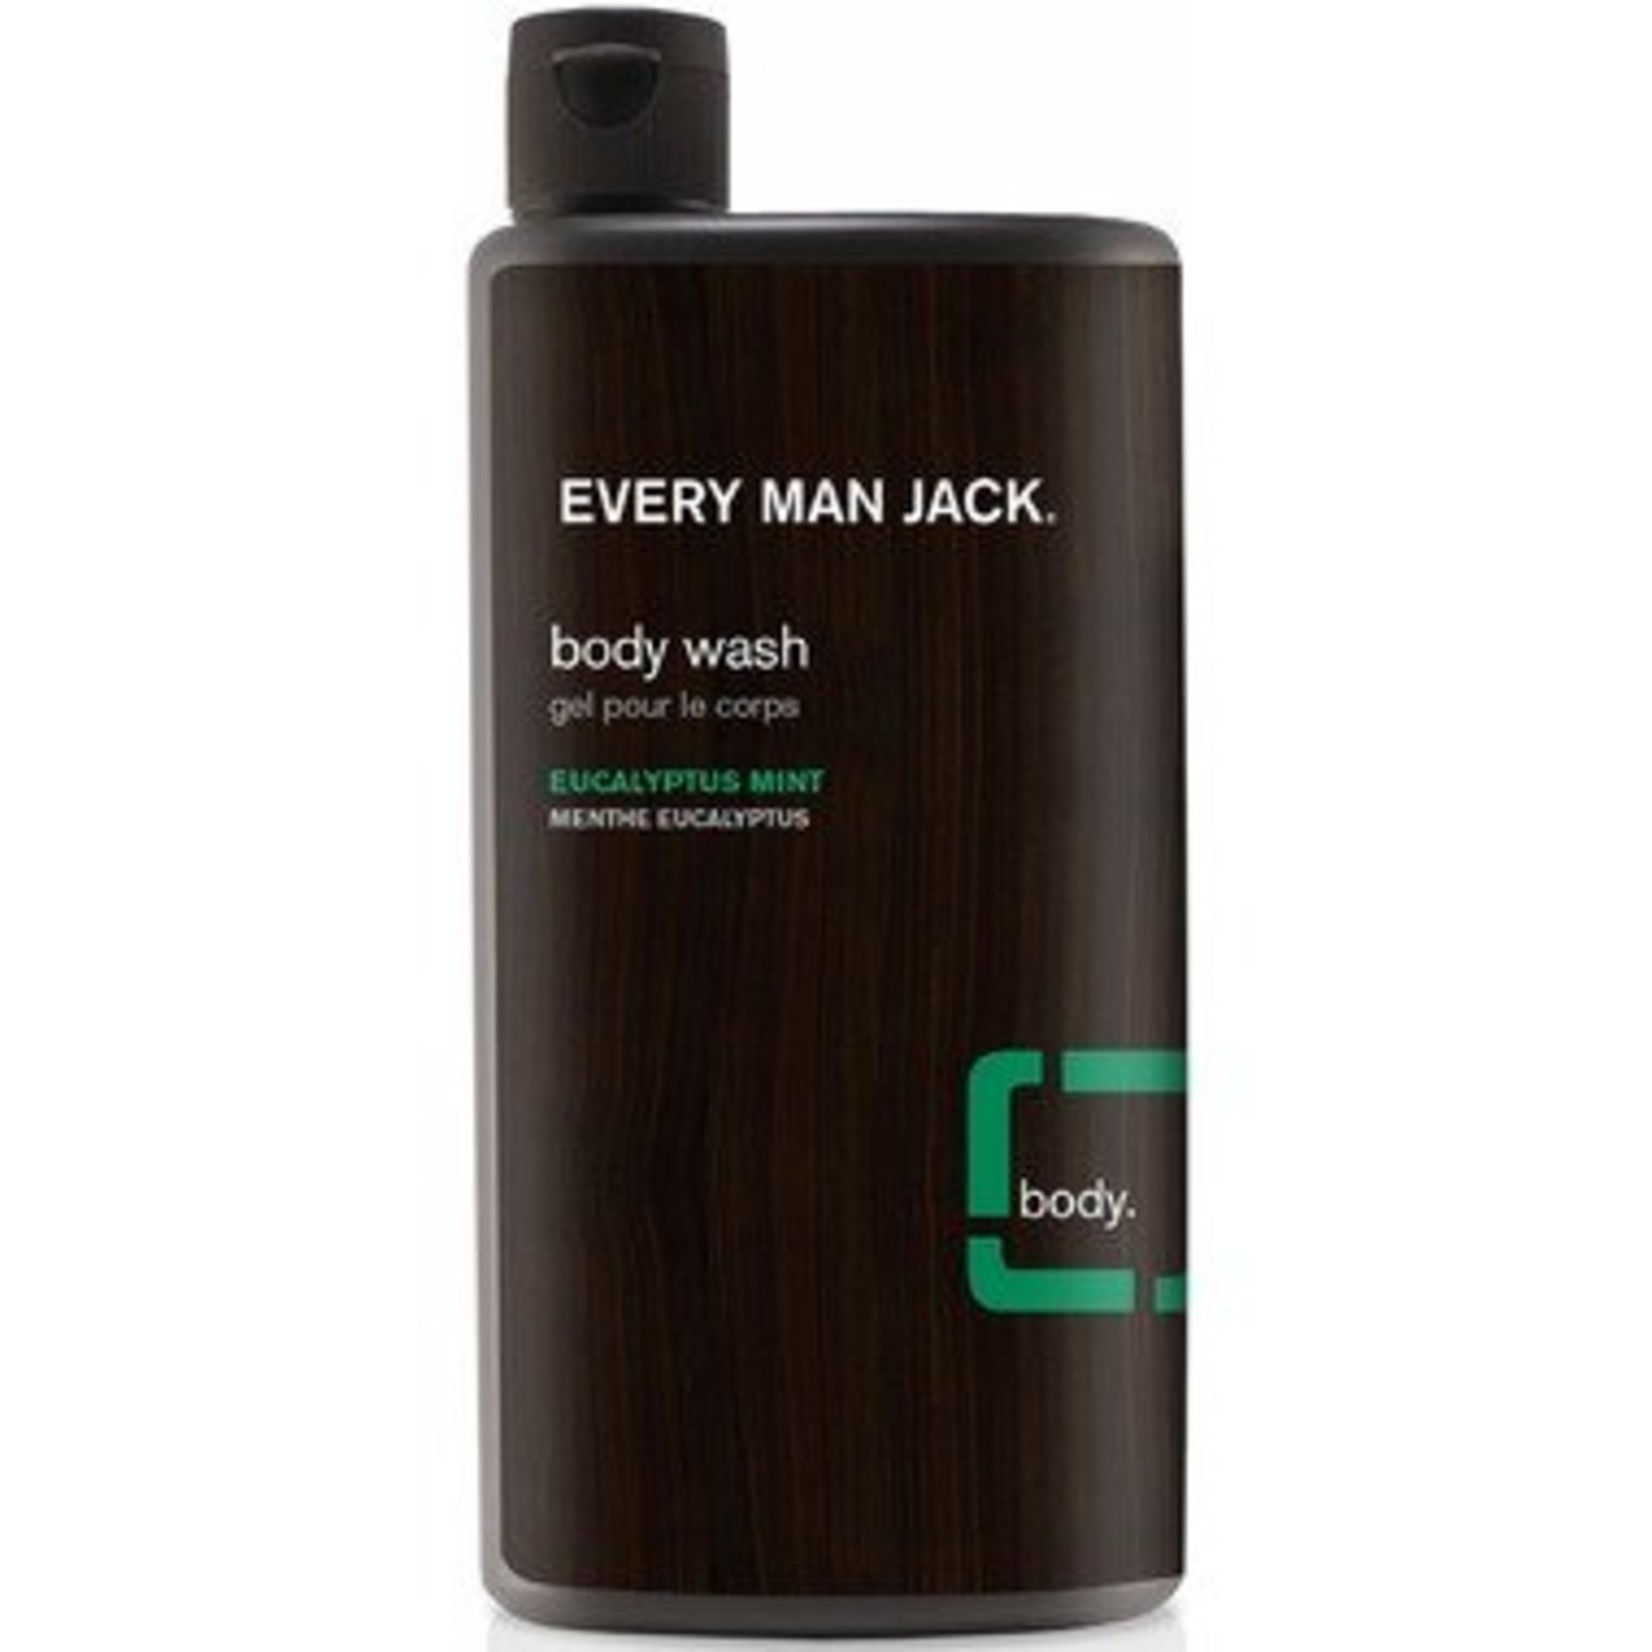 Every Man Jack Every Man Jack Body Wash Eucalyptus Mint 500ml